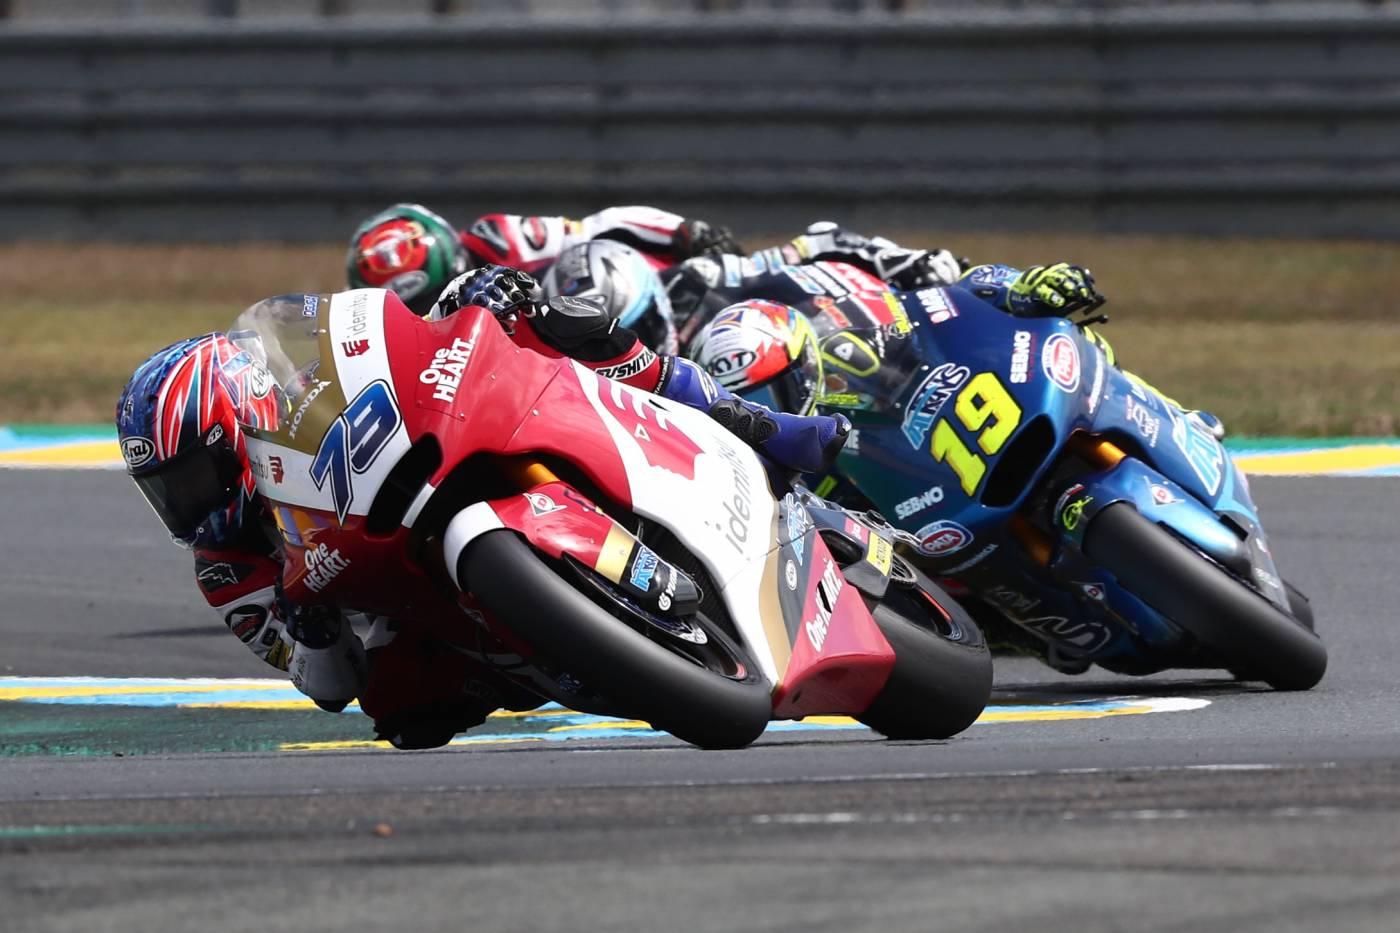 IDEMITSU Honda Team Asiaの両ライダーがポイントを獲得